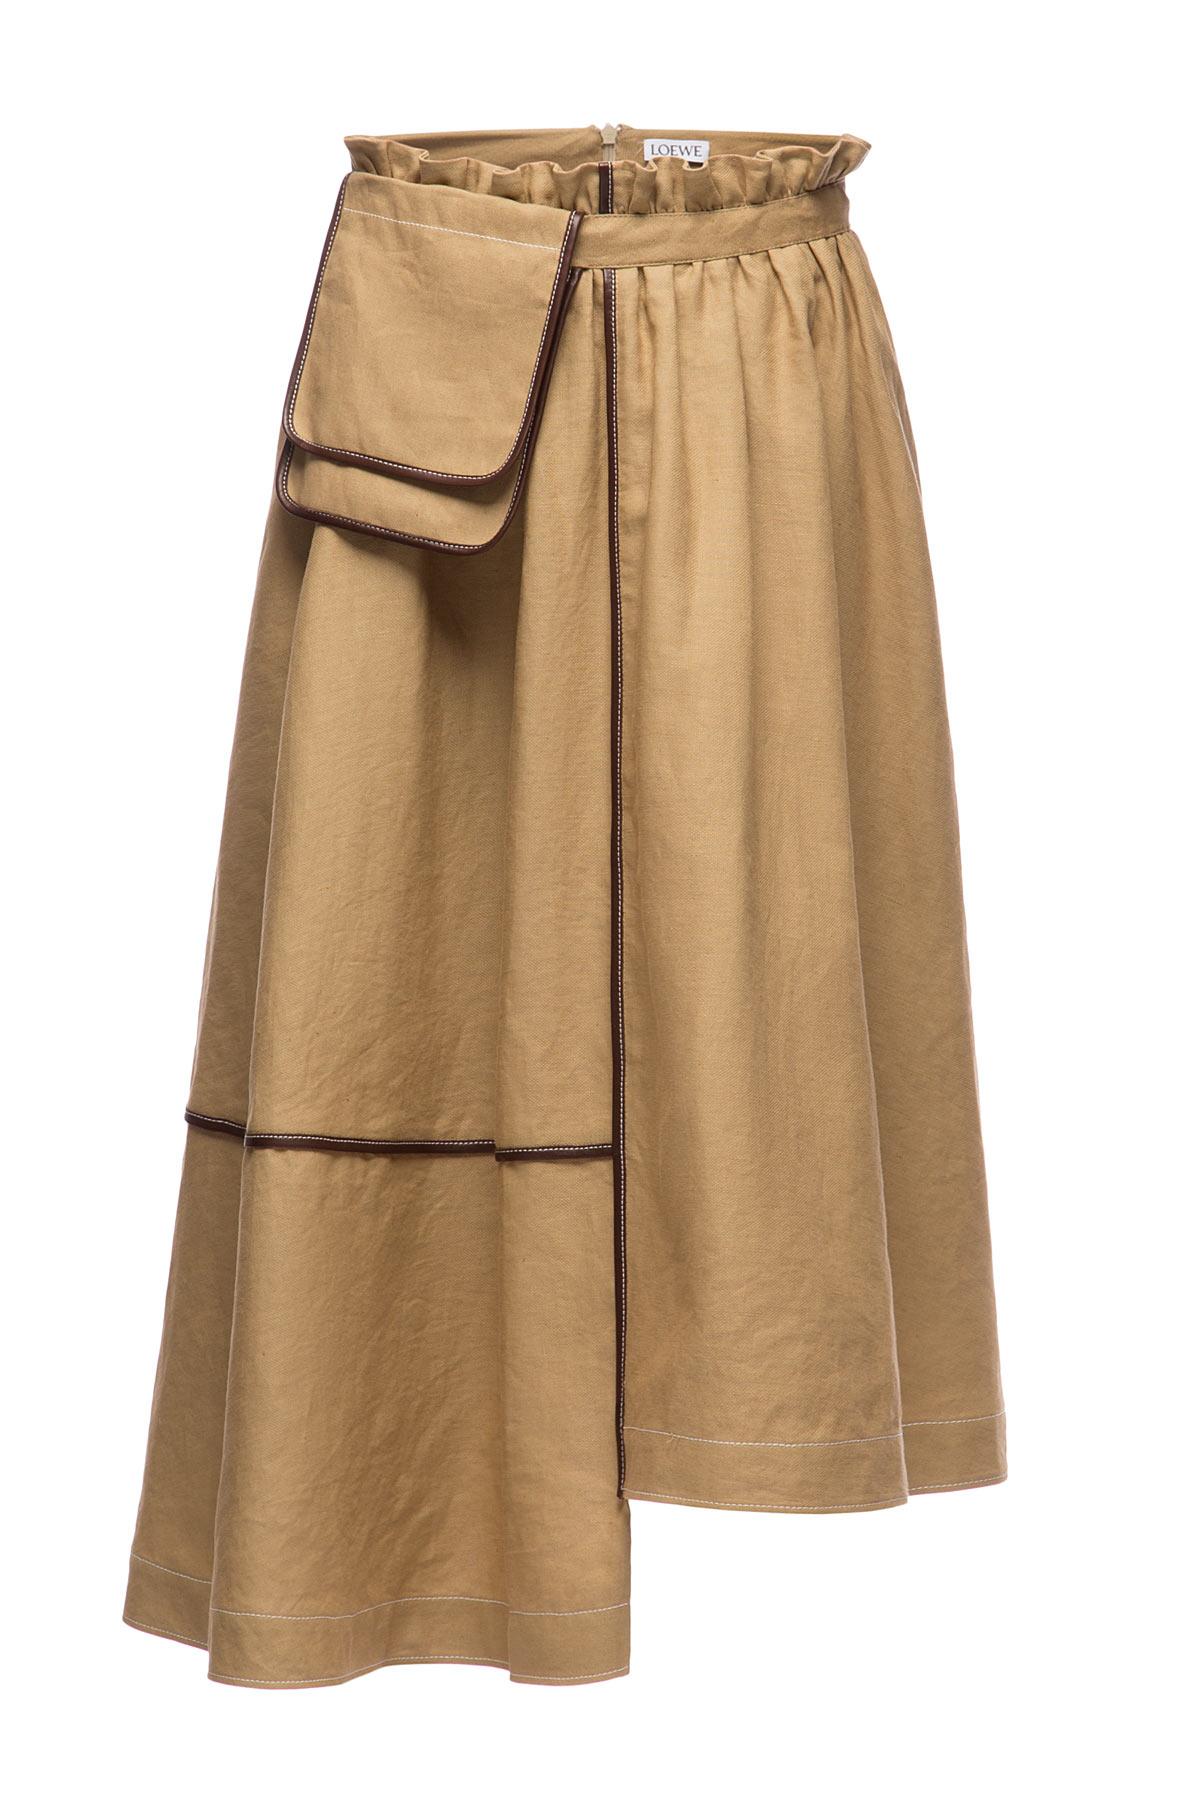 LOEWE Skirt Belt Pocket Saharienne Beige front